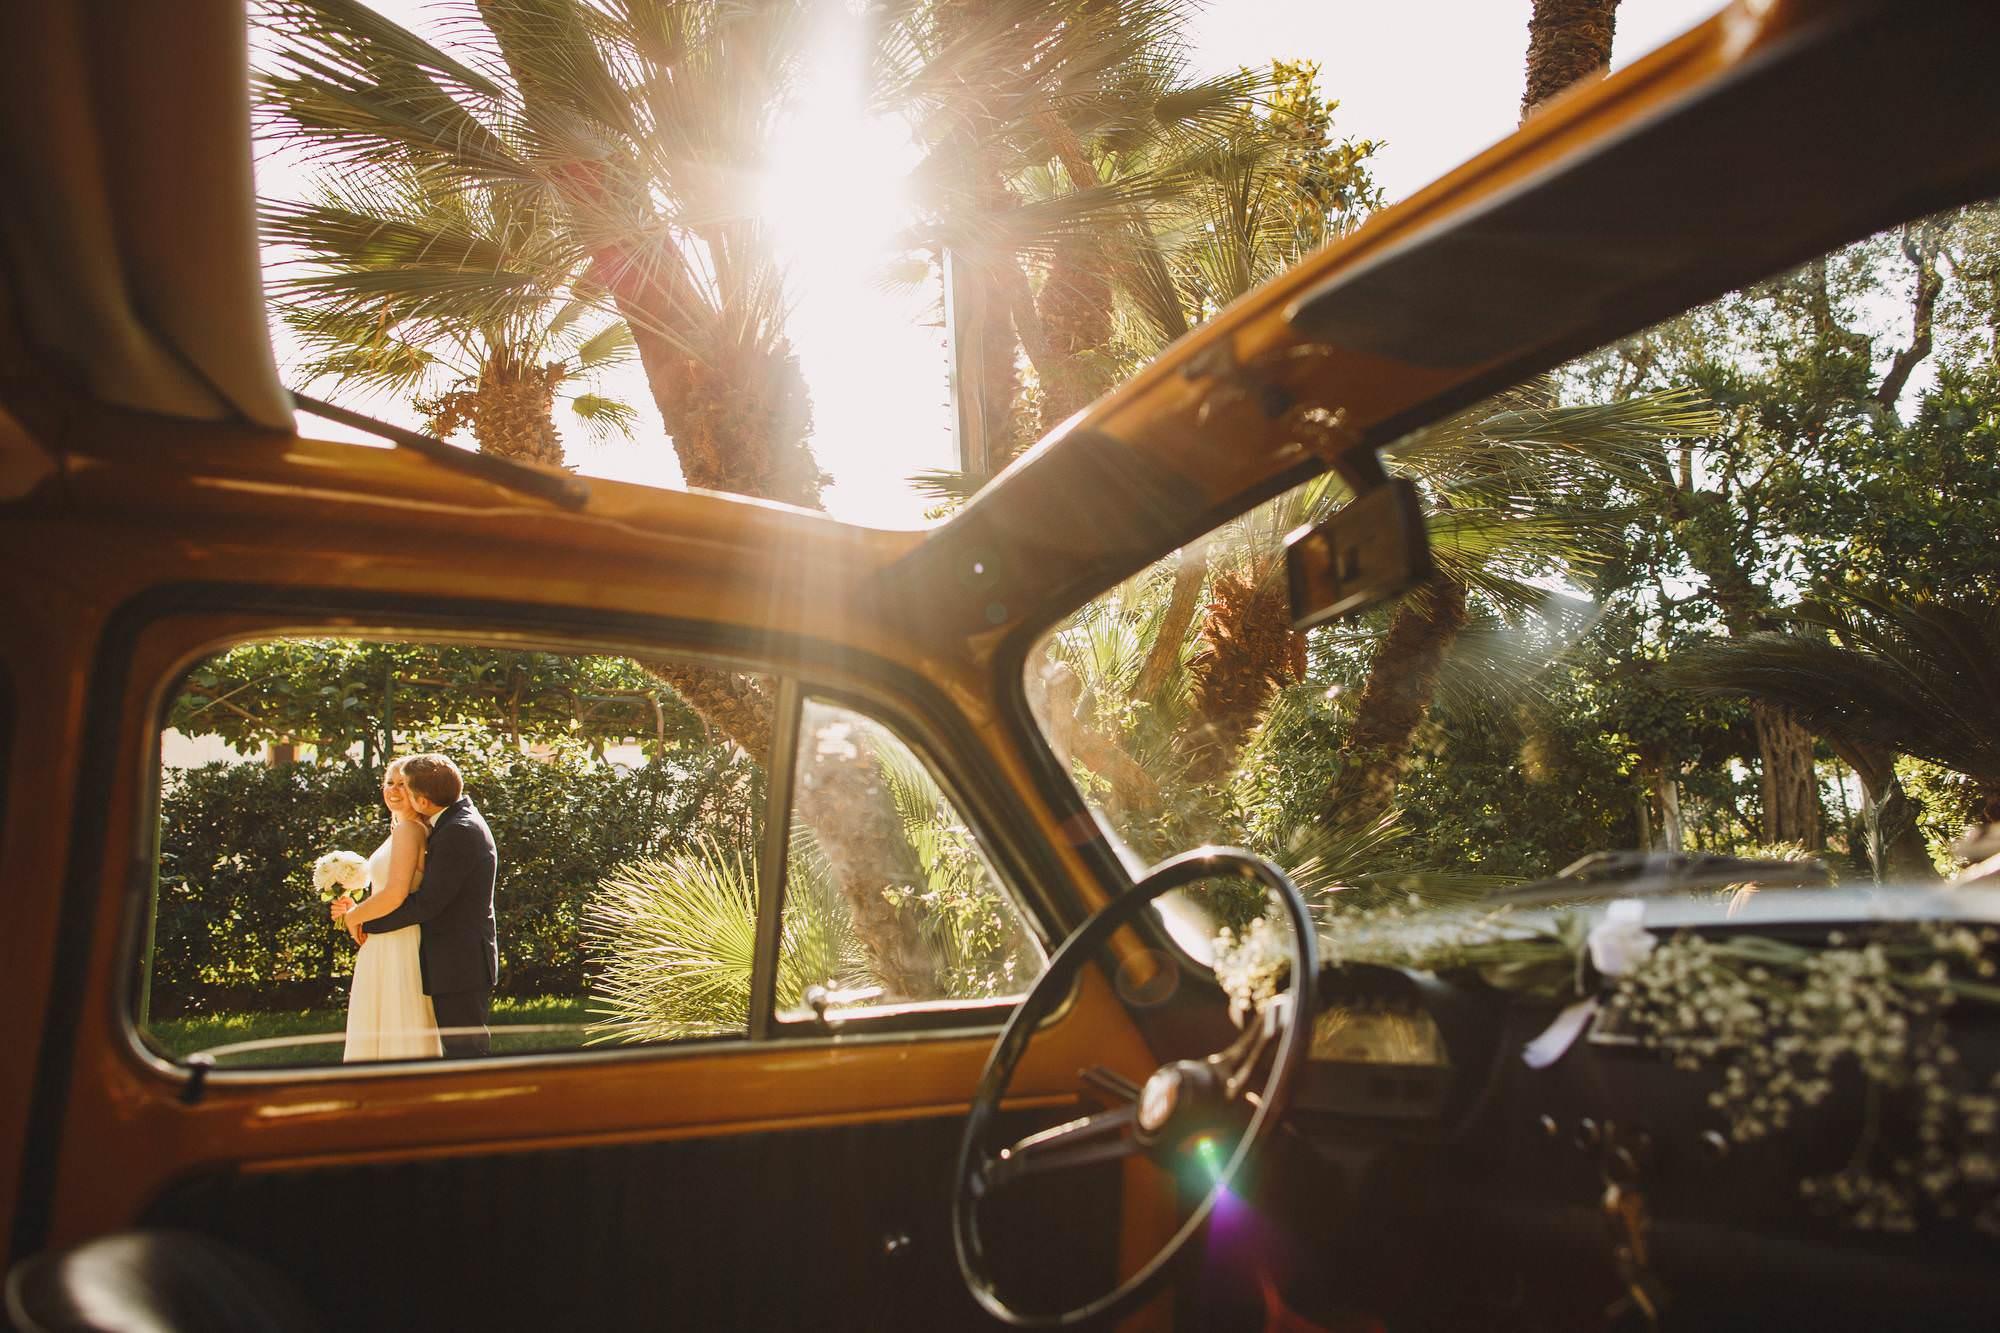 Destination wedding photography Italy - Hotel Vittoria Sorrento